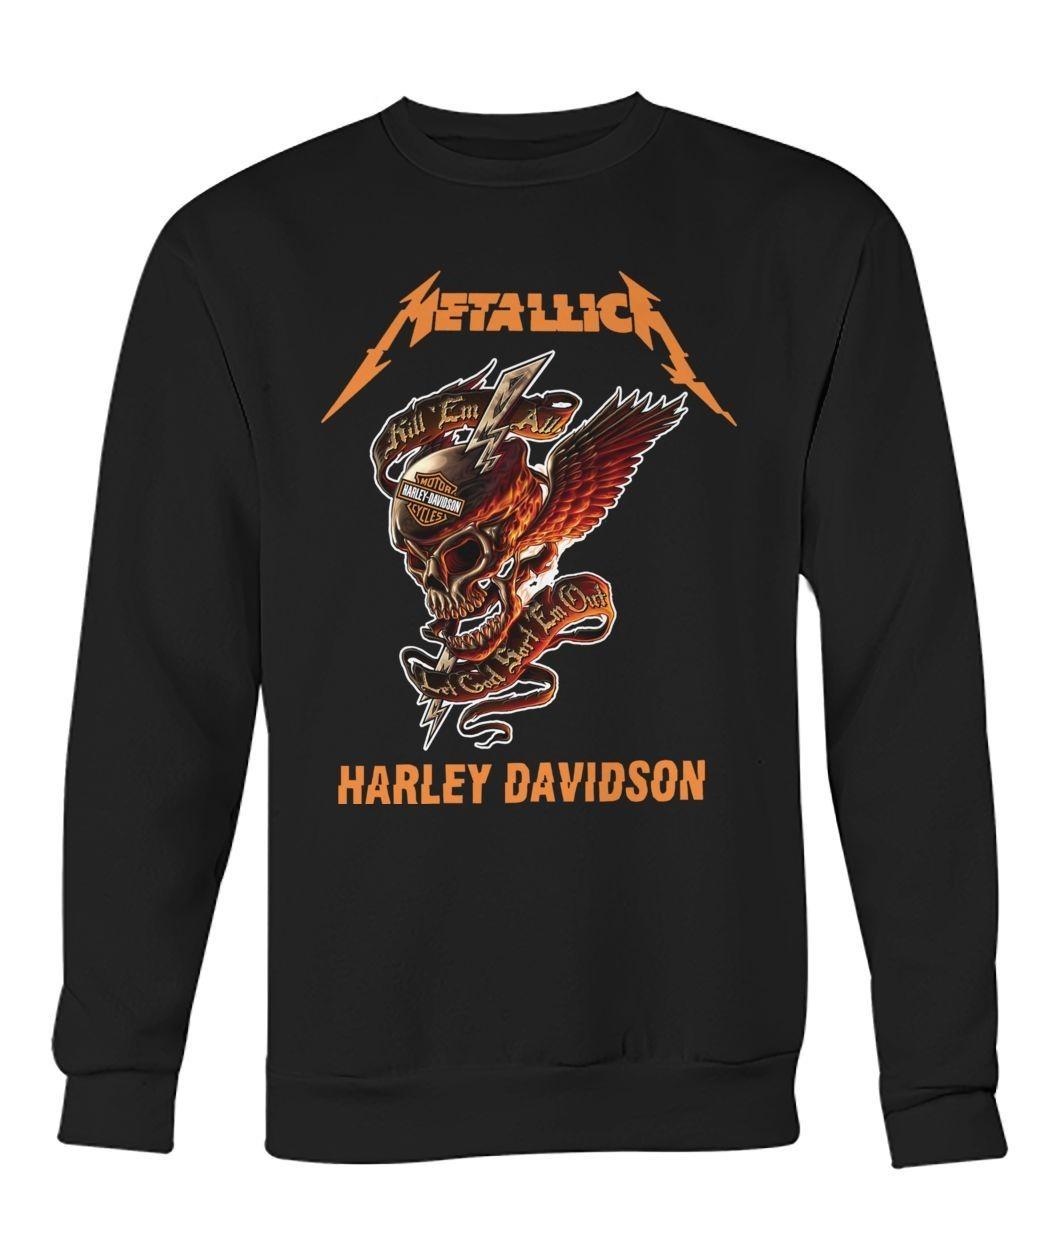 Metallica Harley Davidson Skull shirt